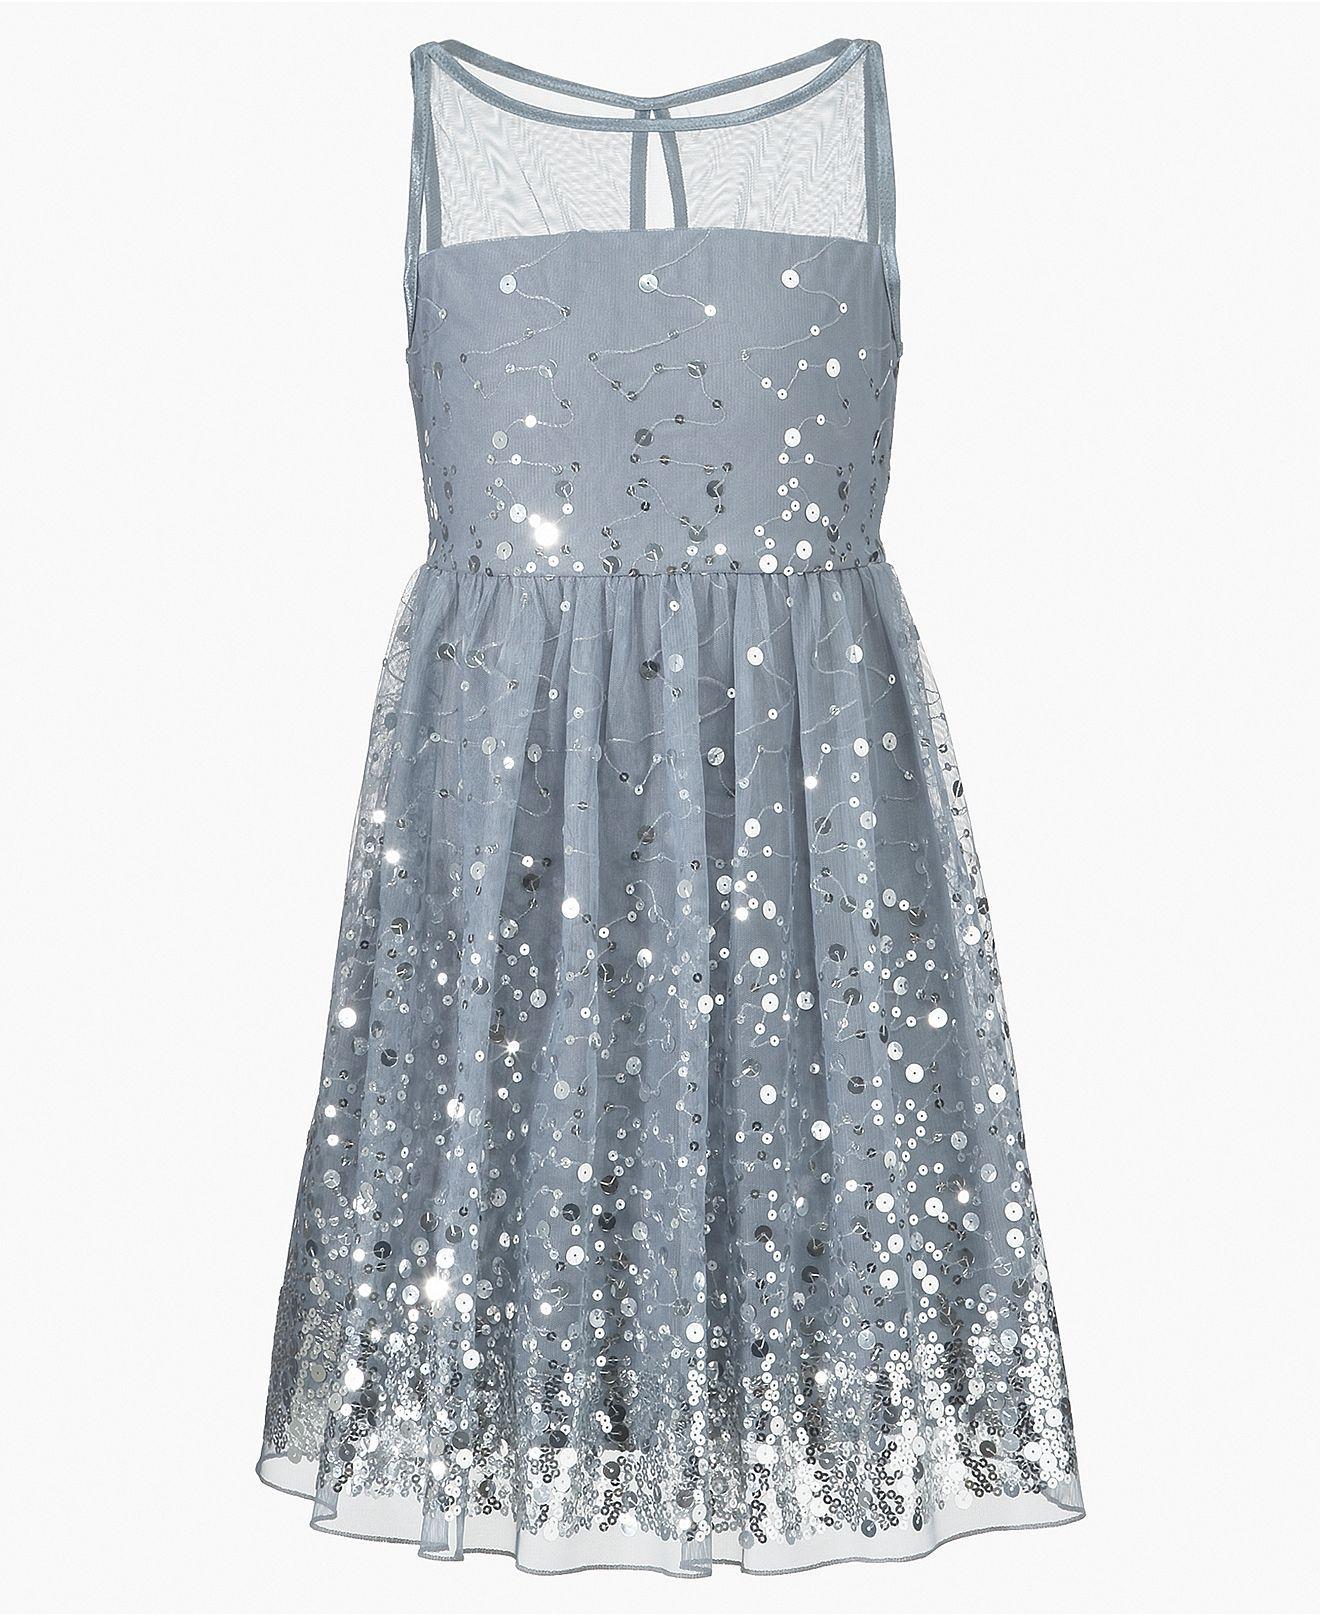 high low dresses for kids - Google Search | Closet | Pinterest